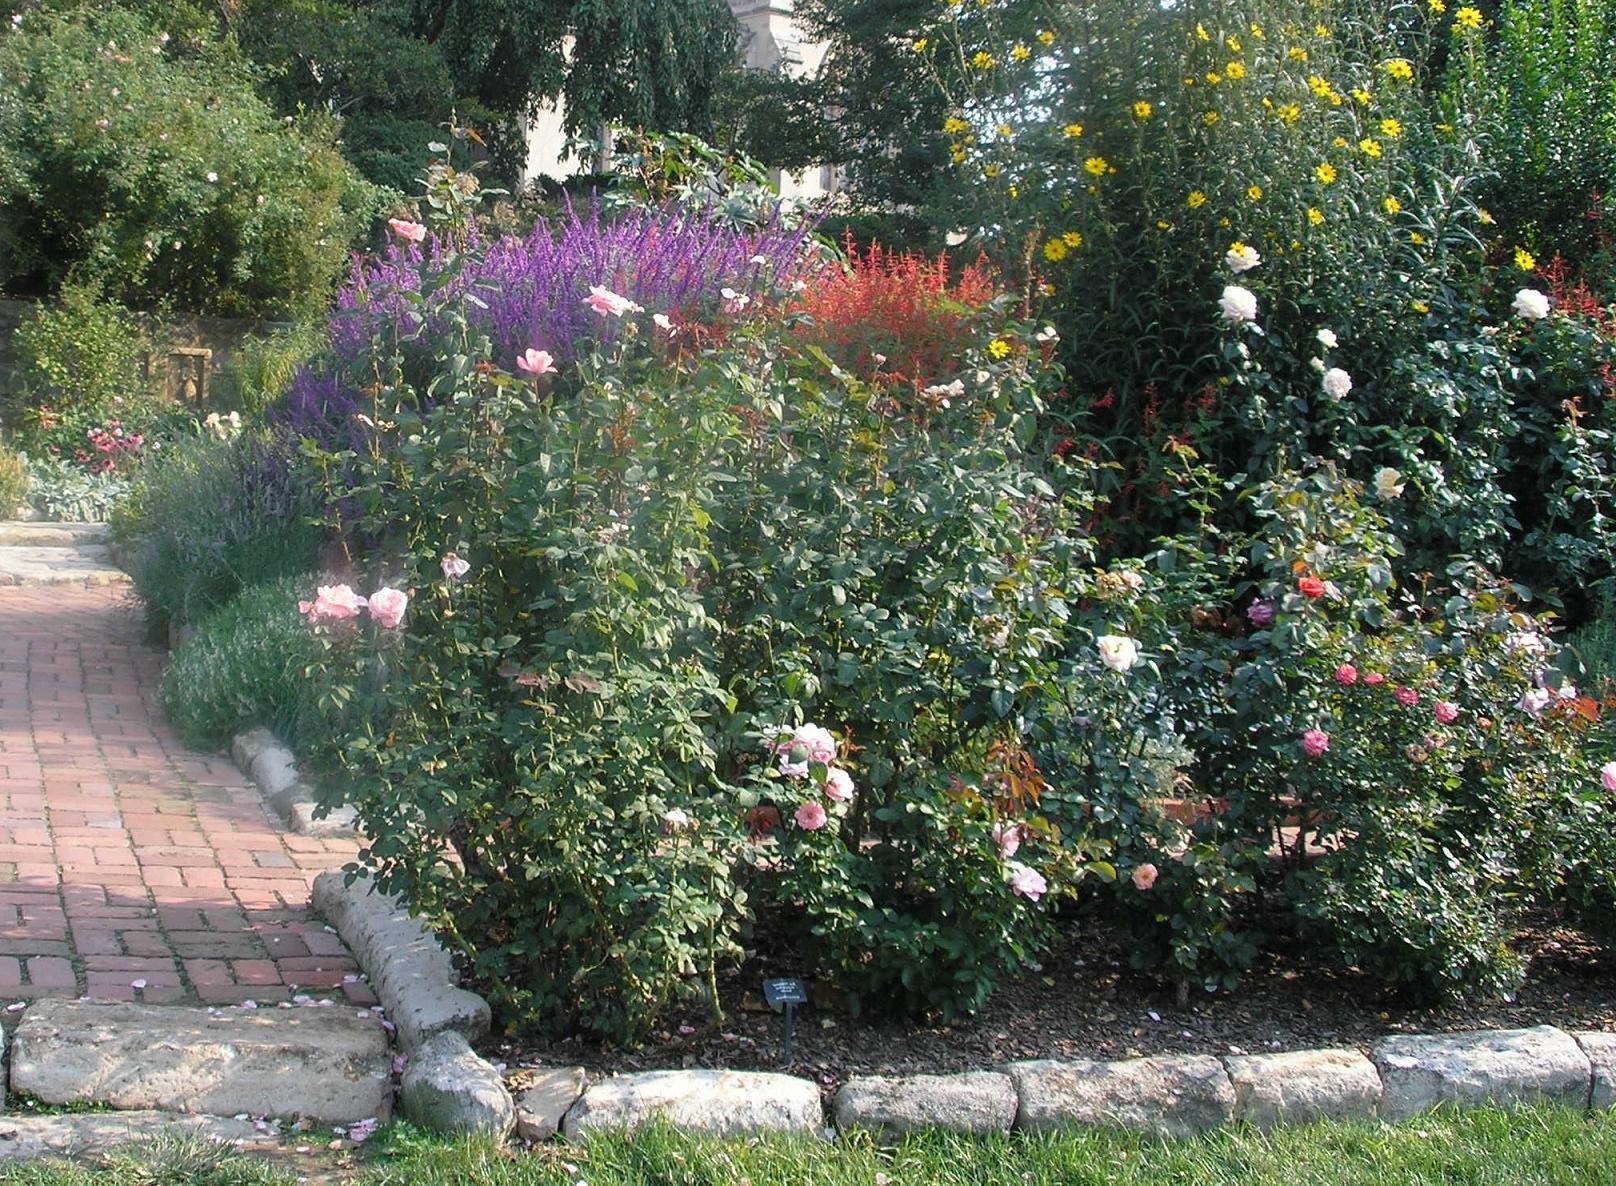 Bordure Jardin : Installer Des Bordures De Jardin | Pratique.fr encequiconcerne Bordure Jardin Pas Cher